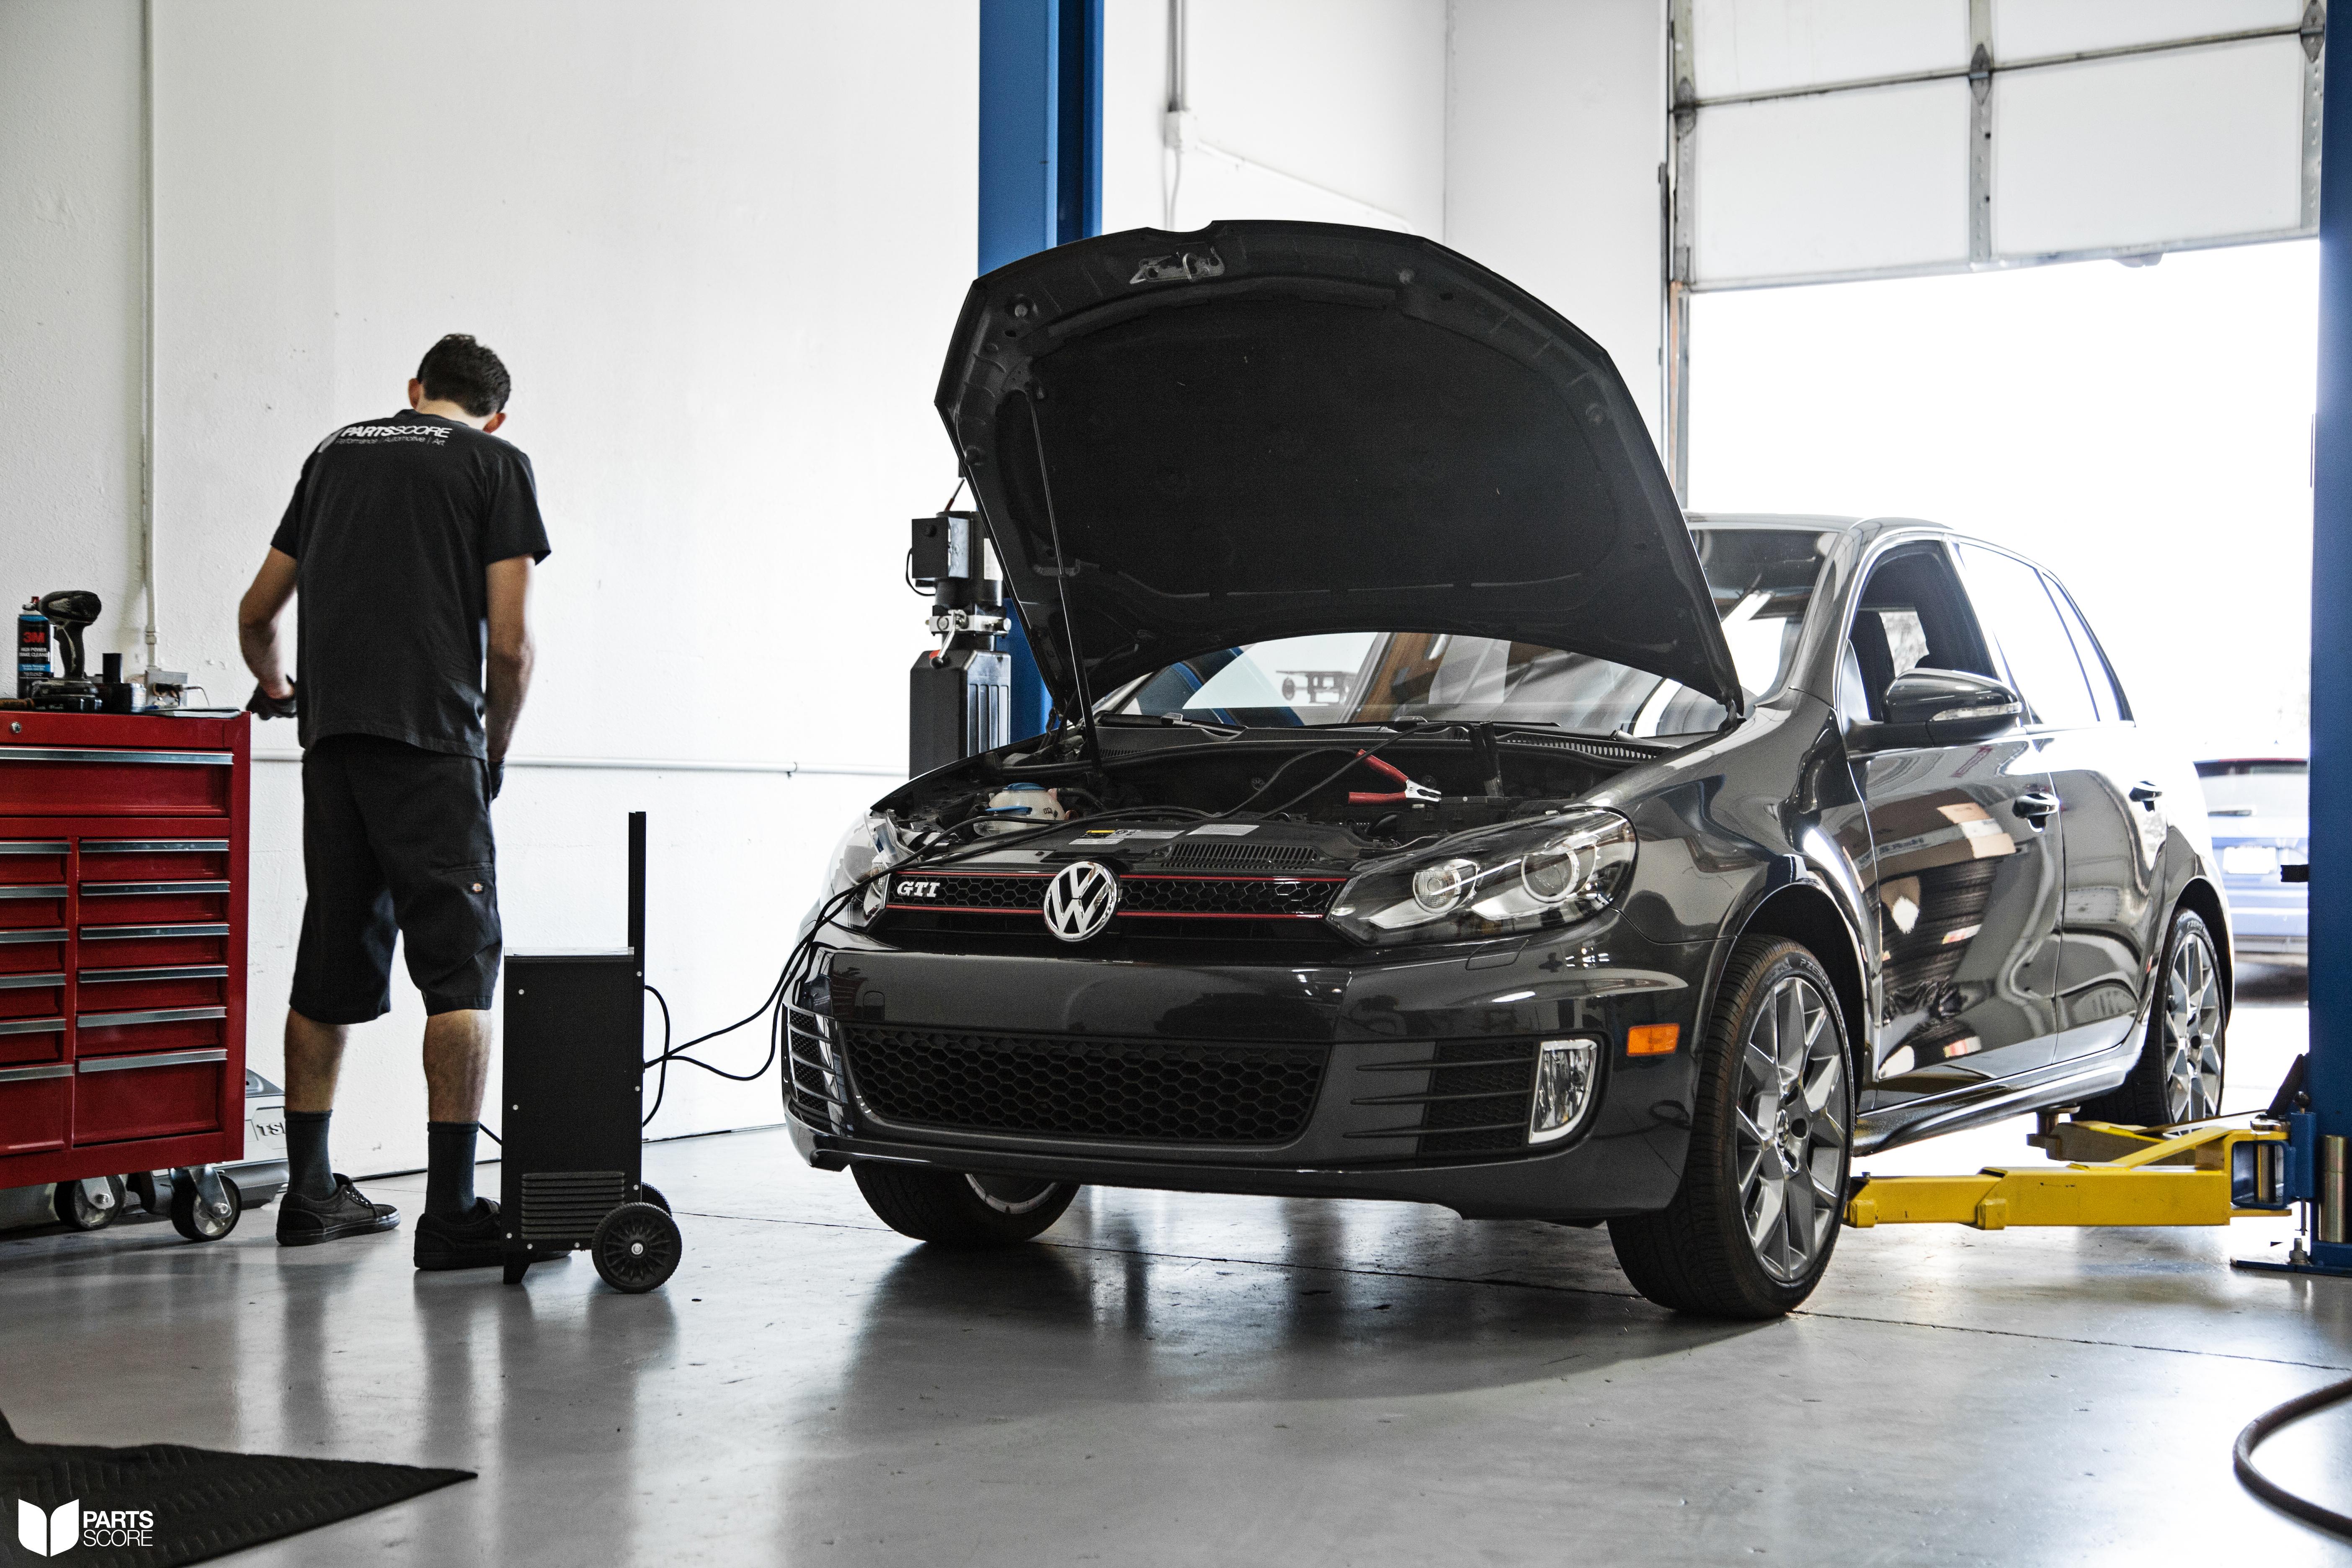 The 2015 VW Mk6 GTI, GIAC Flash